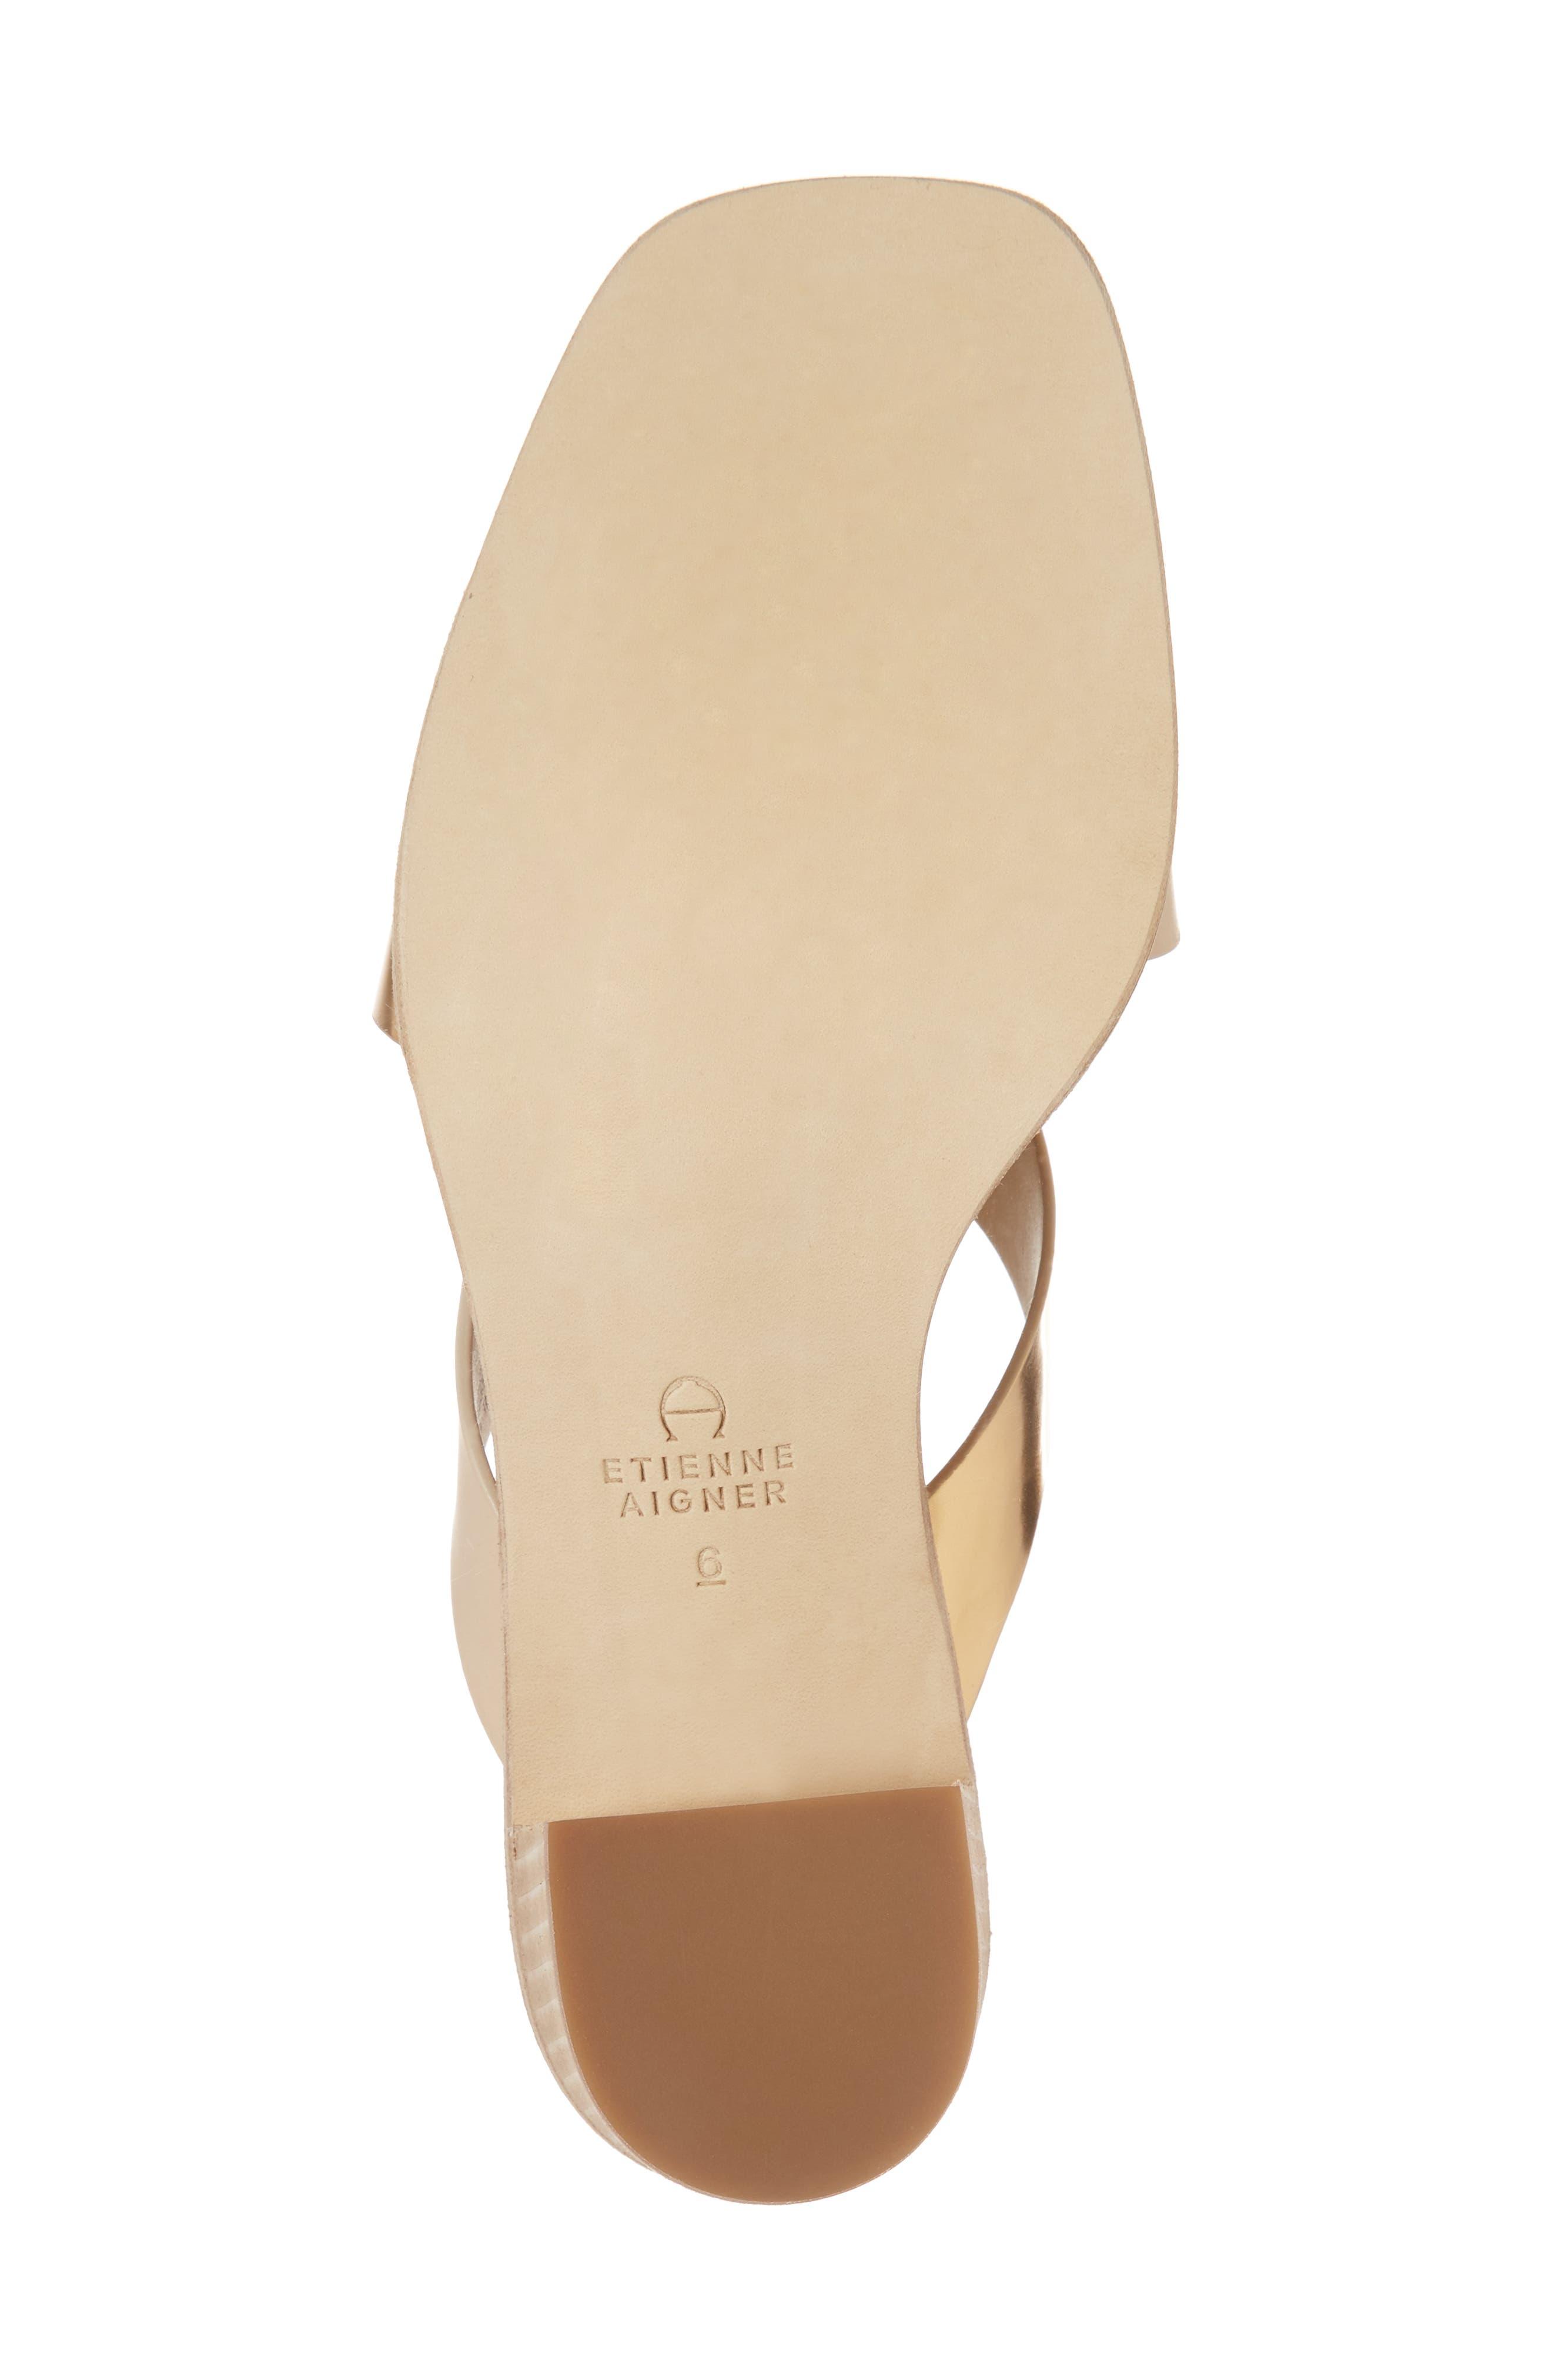 Negroni Cross Strap Mule Sandal,                             Alternate thumbnail 6, color,                             Natural/ Gold Leather